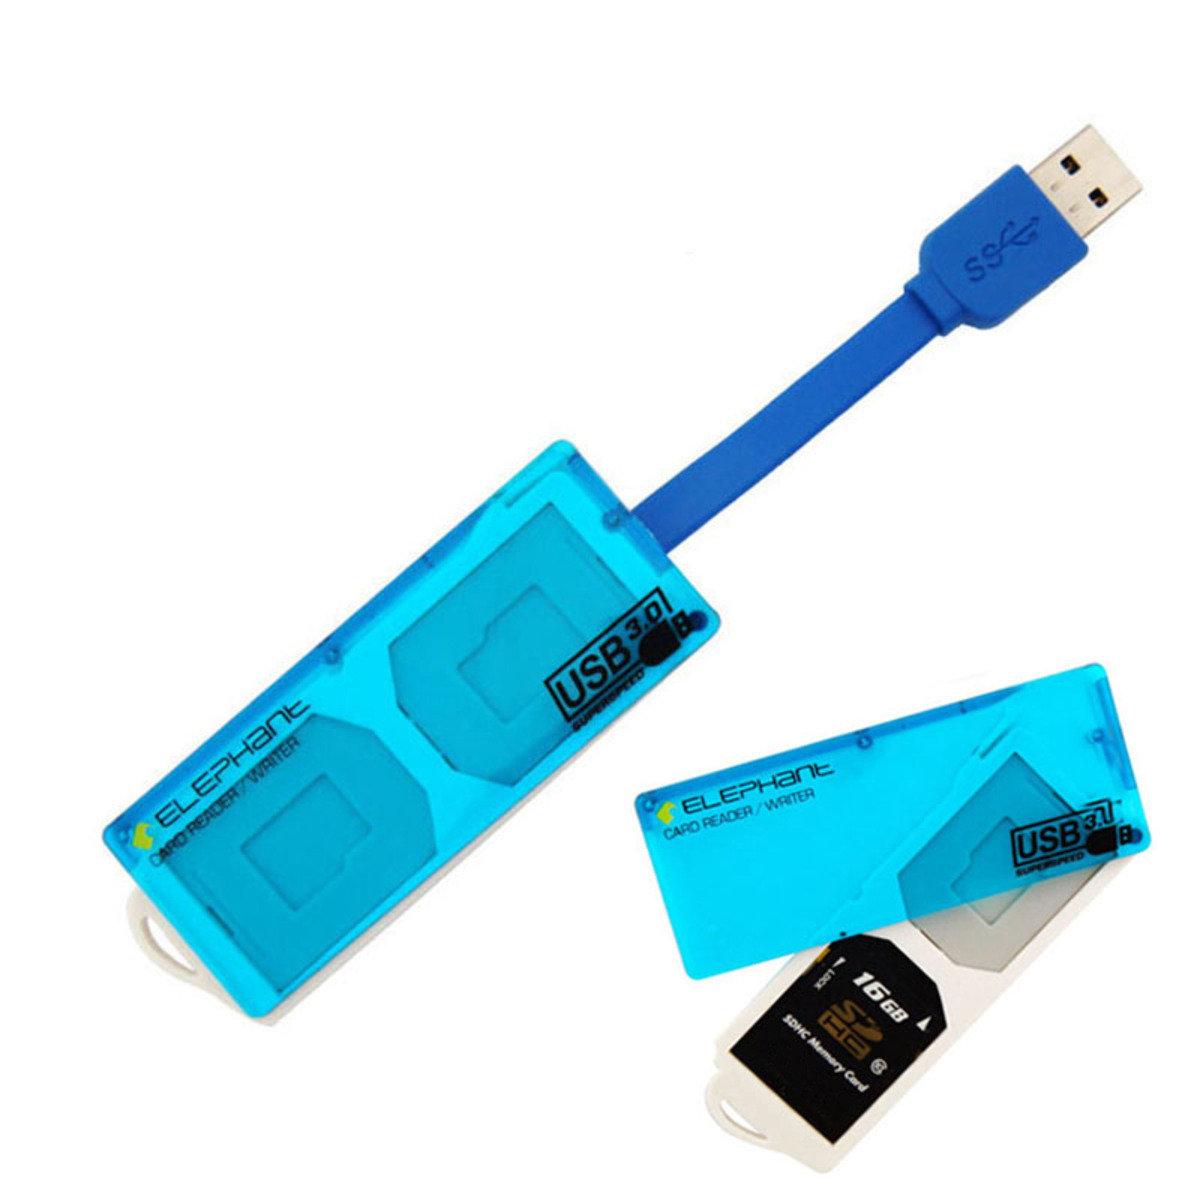 USB 3.0 讀卡器